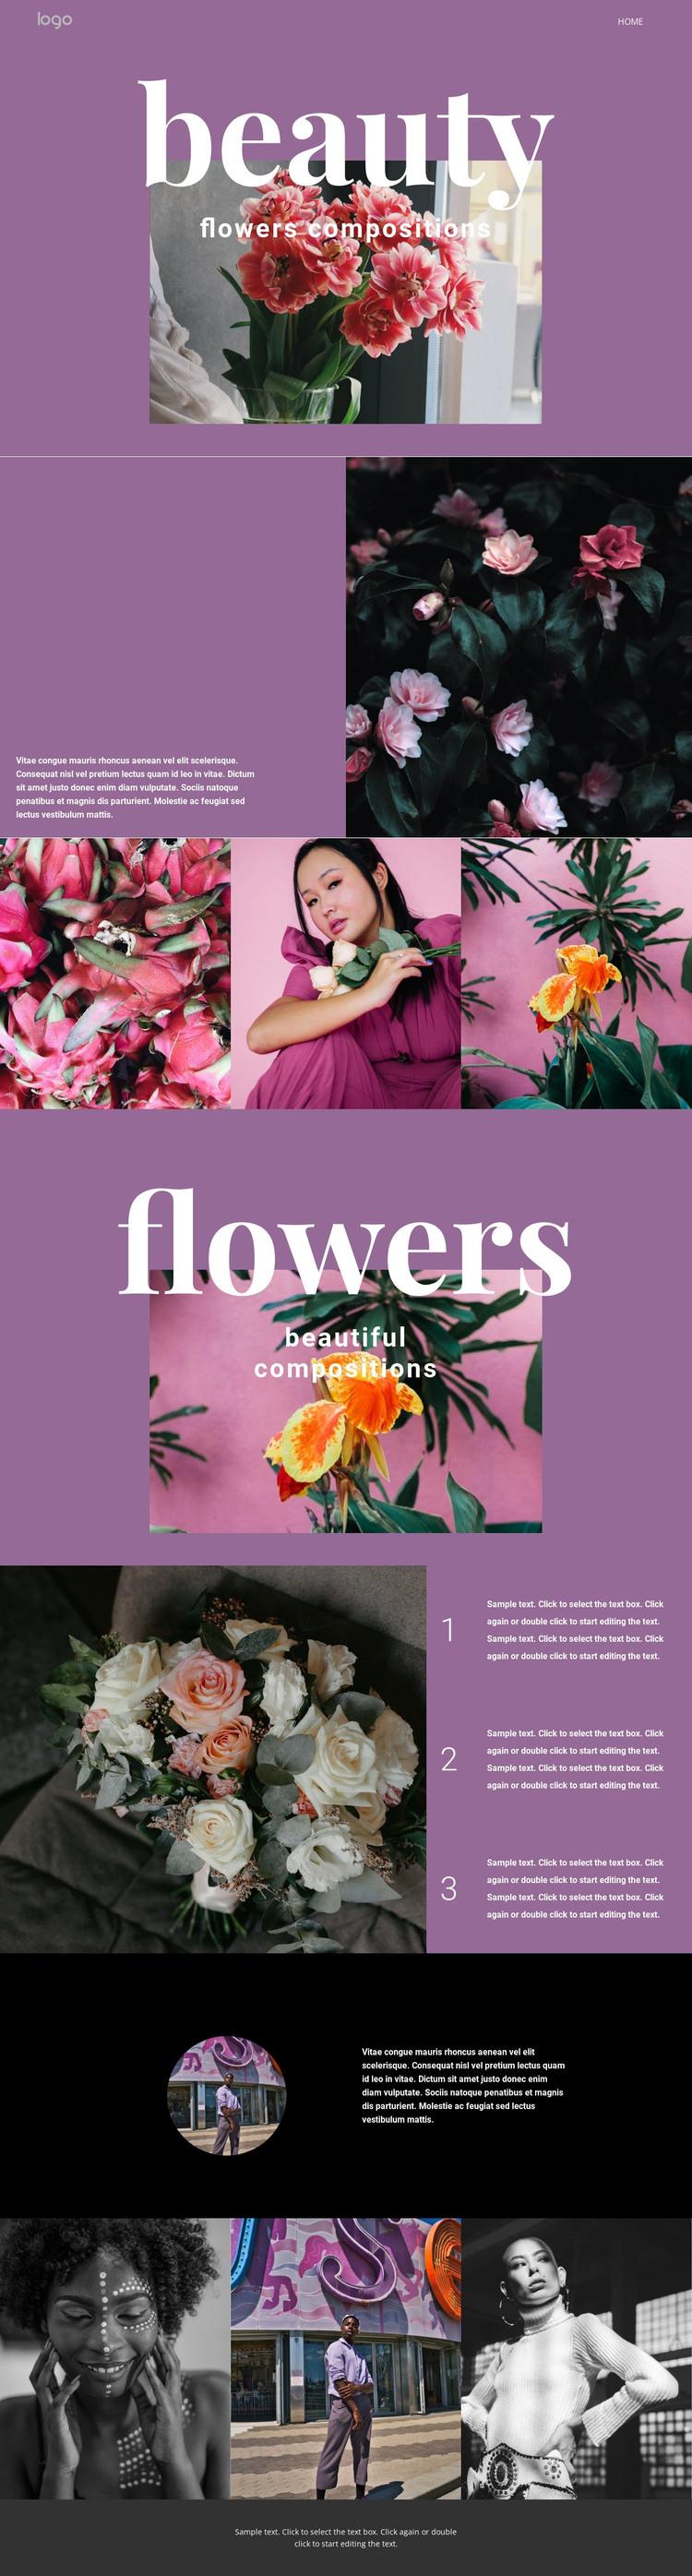 Flower salon WordPress Theme